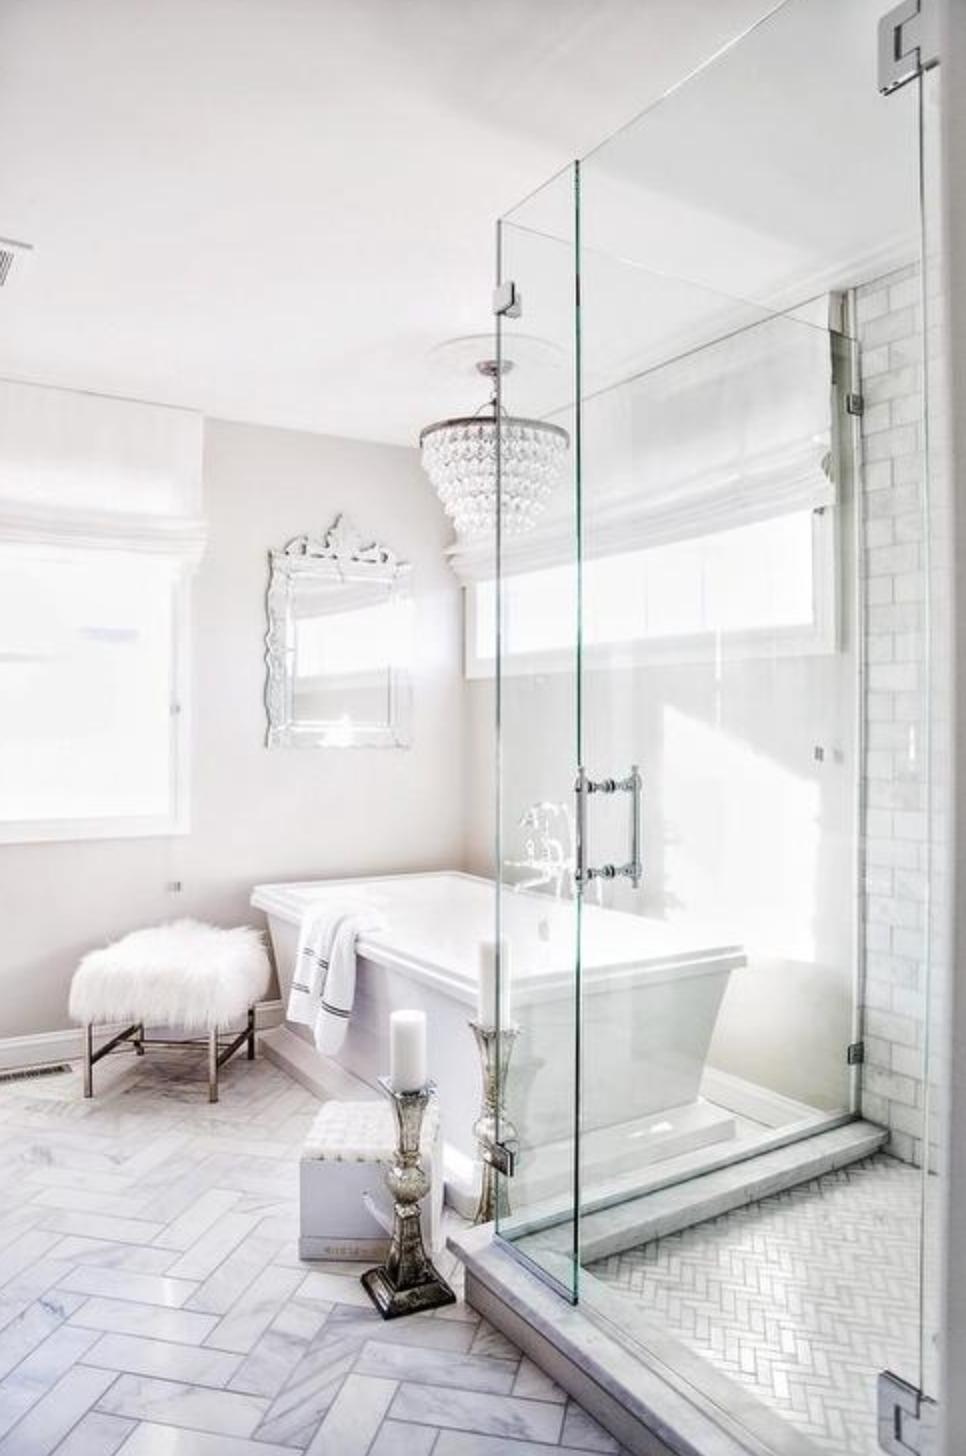 15 Most Beautiful Bathrooms On Pinterest Traditional Glam Bathroom White Marble Tile Design Bathroom Remodel Designs Bathroom Makeover Master Bathroom Makeover